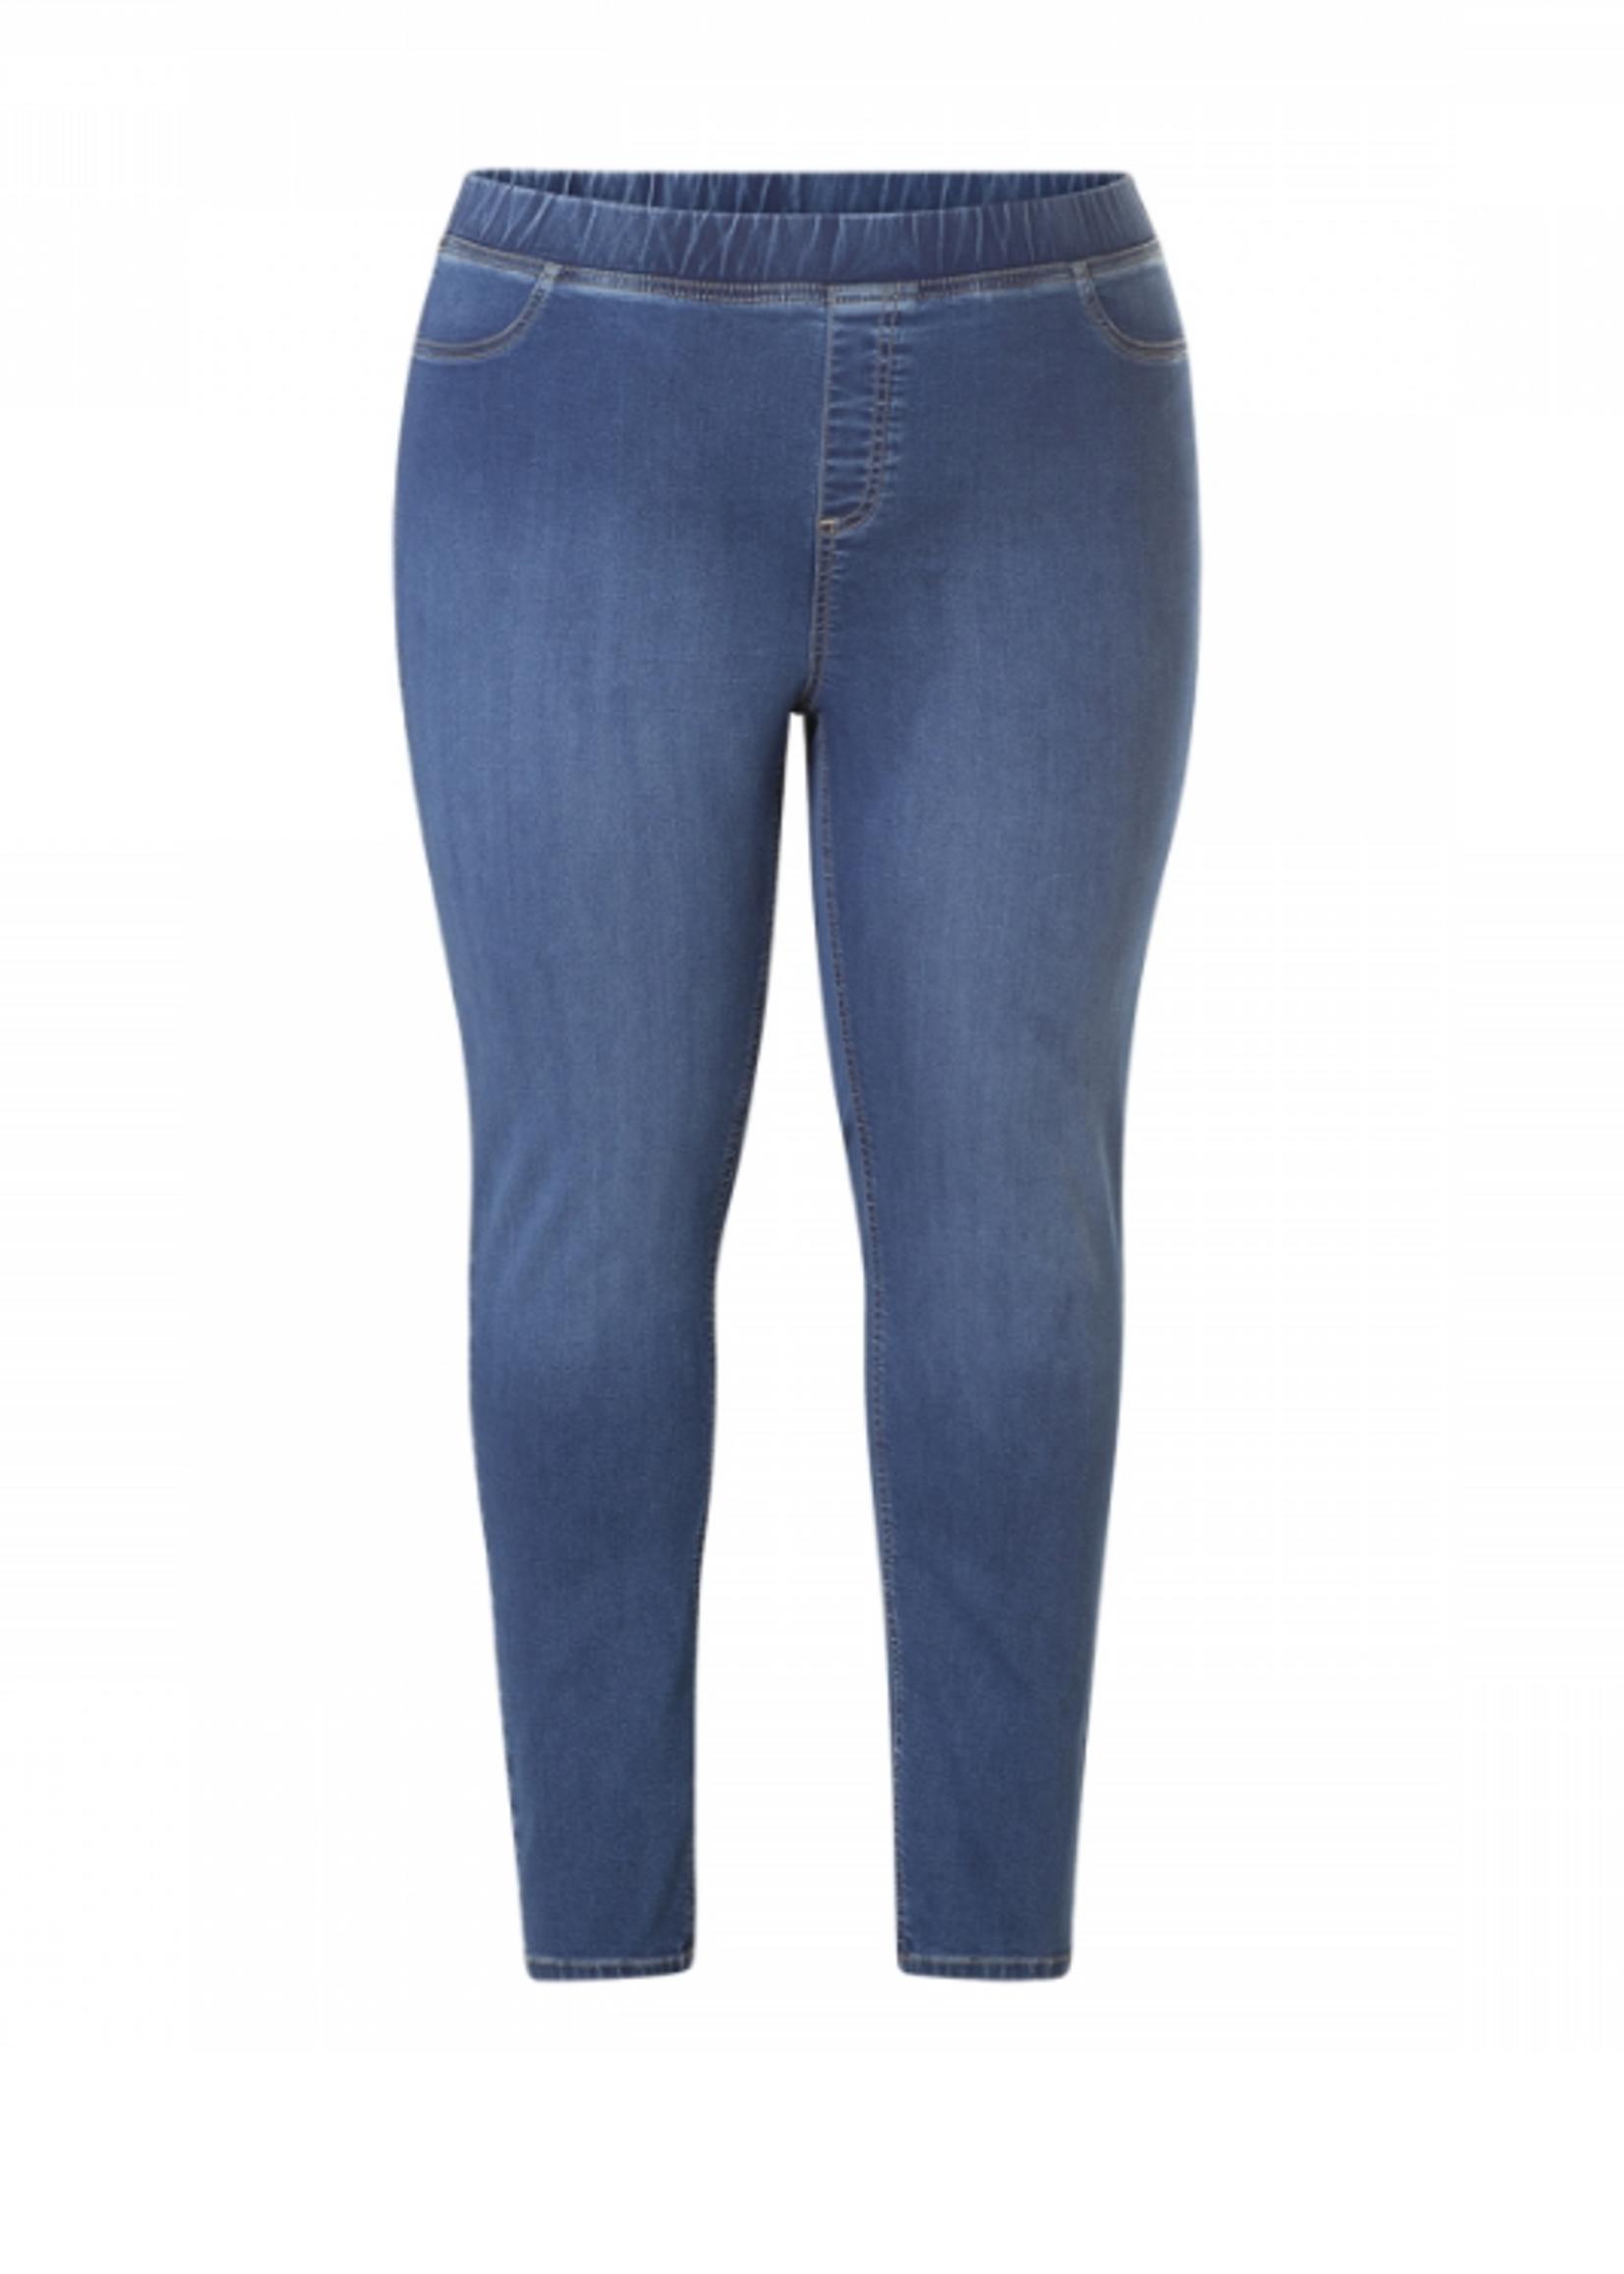 Yest Yest Tess Jeans